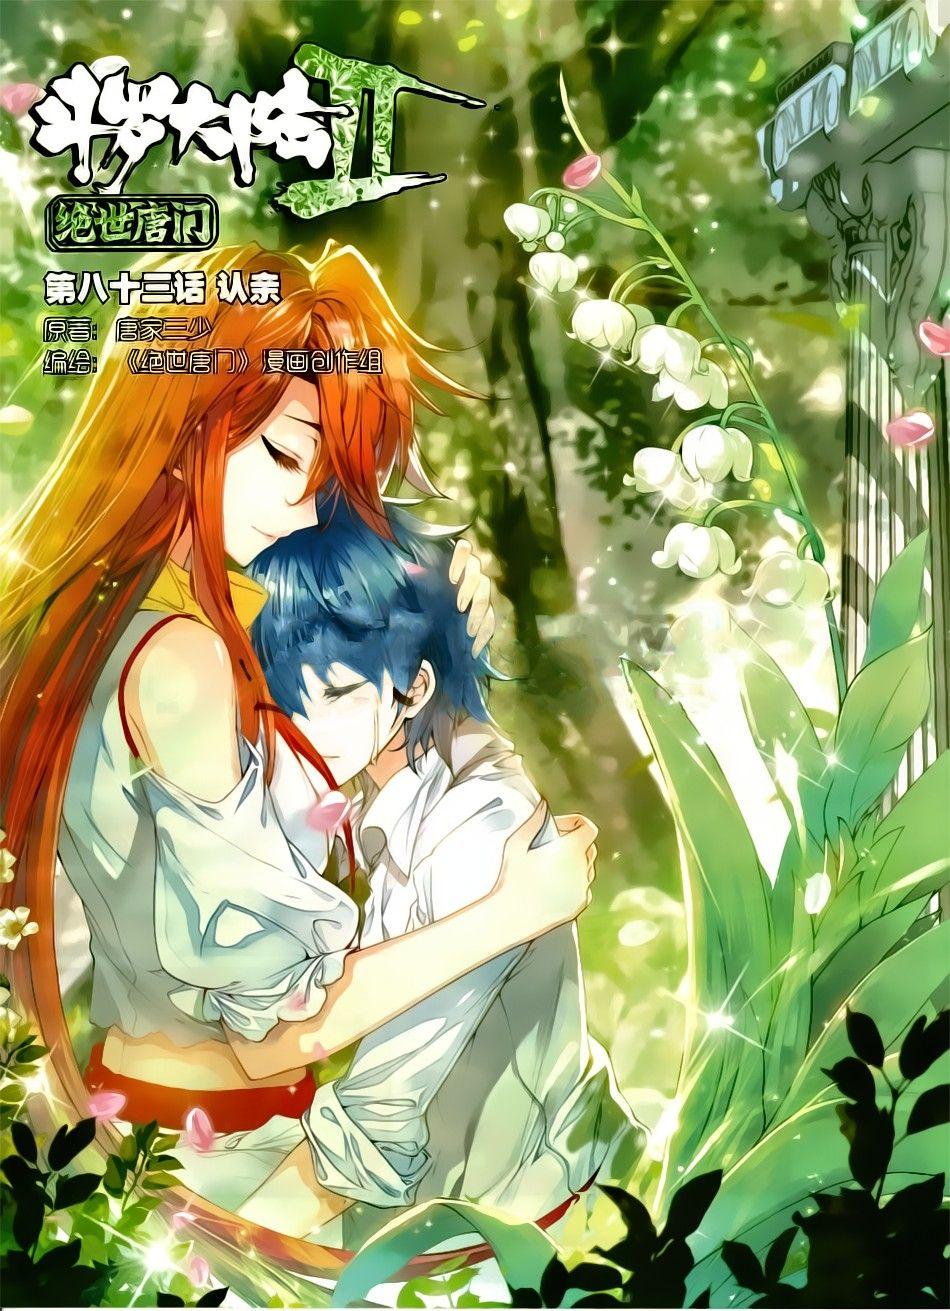 http://c5.ninemanga.com/es_manga/pic2/33/16417/513257/5f31b58aa02a0e80fca86d53a6fac741.jpg Page 1